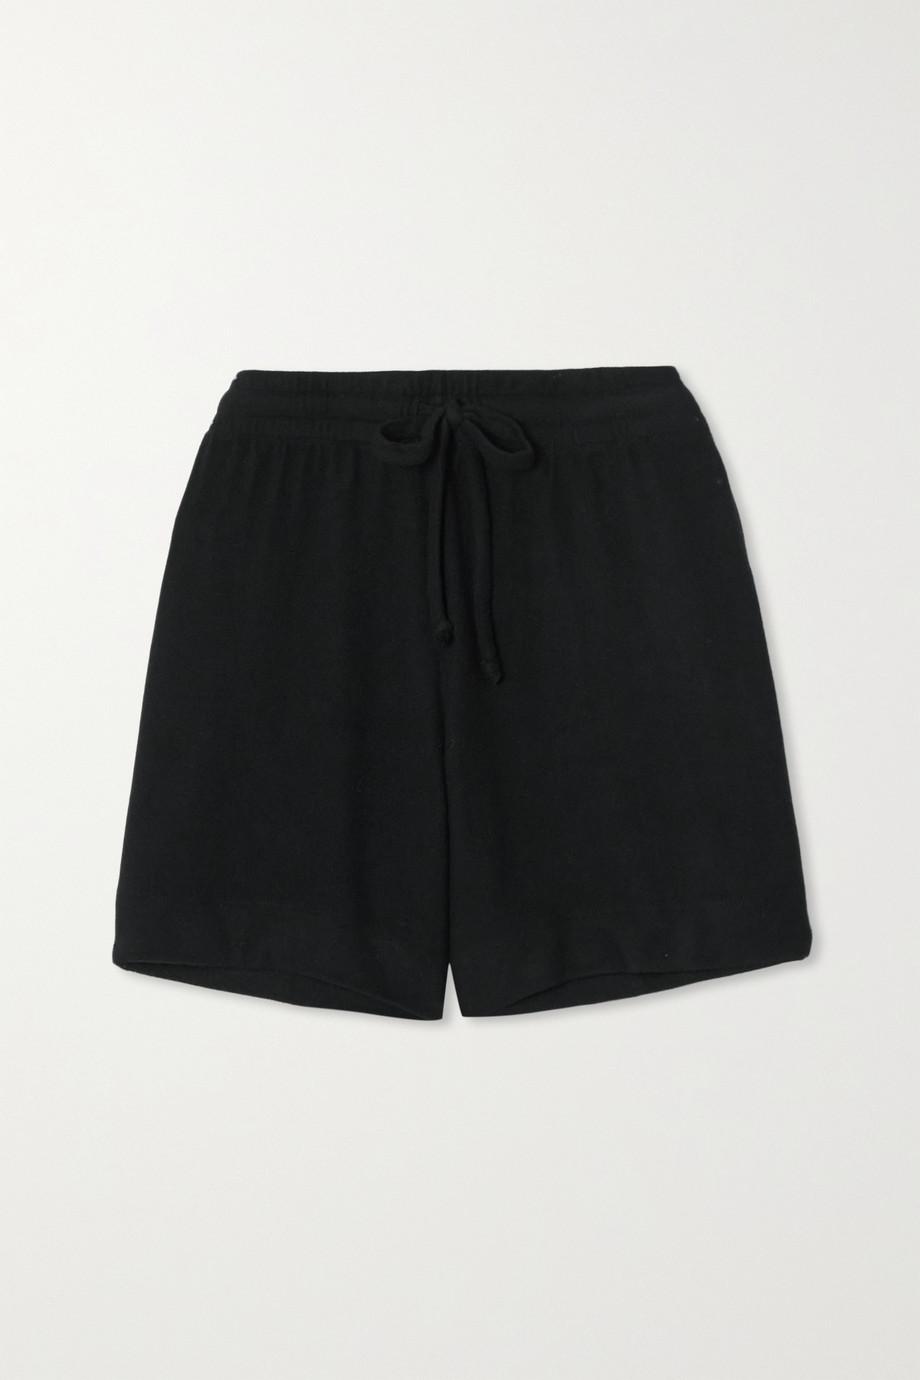 LESET Lori Pyjama-Shorts aus Stretch-Jersey